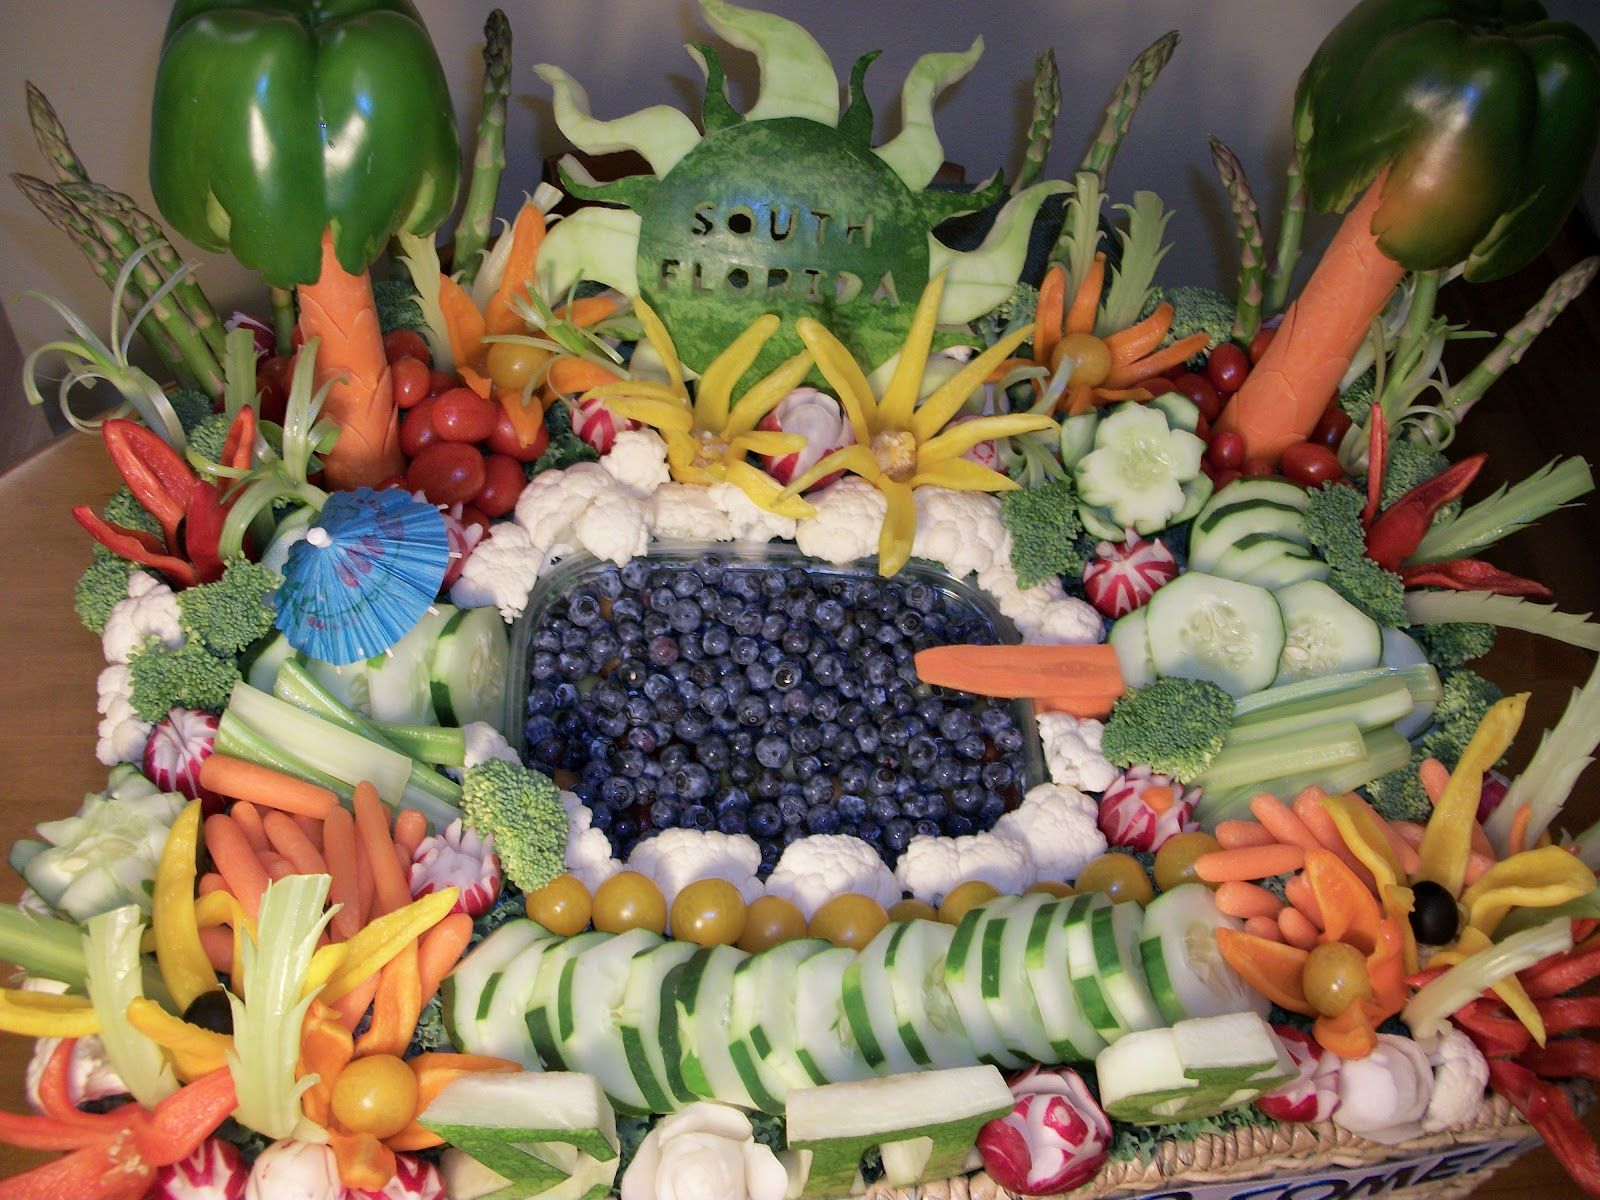 Vegetable Platter Radish Roses Sigma Pi Phi South Florida